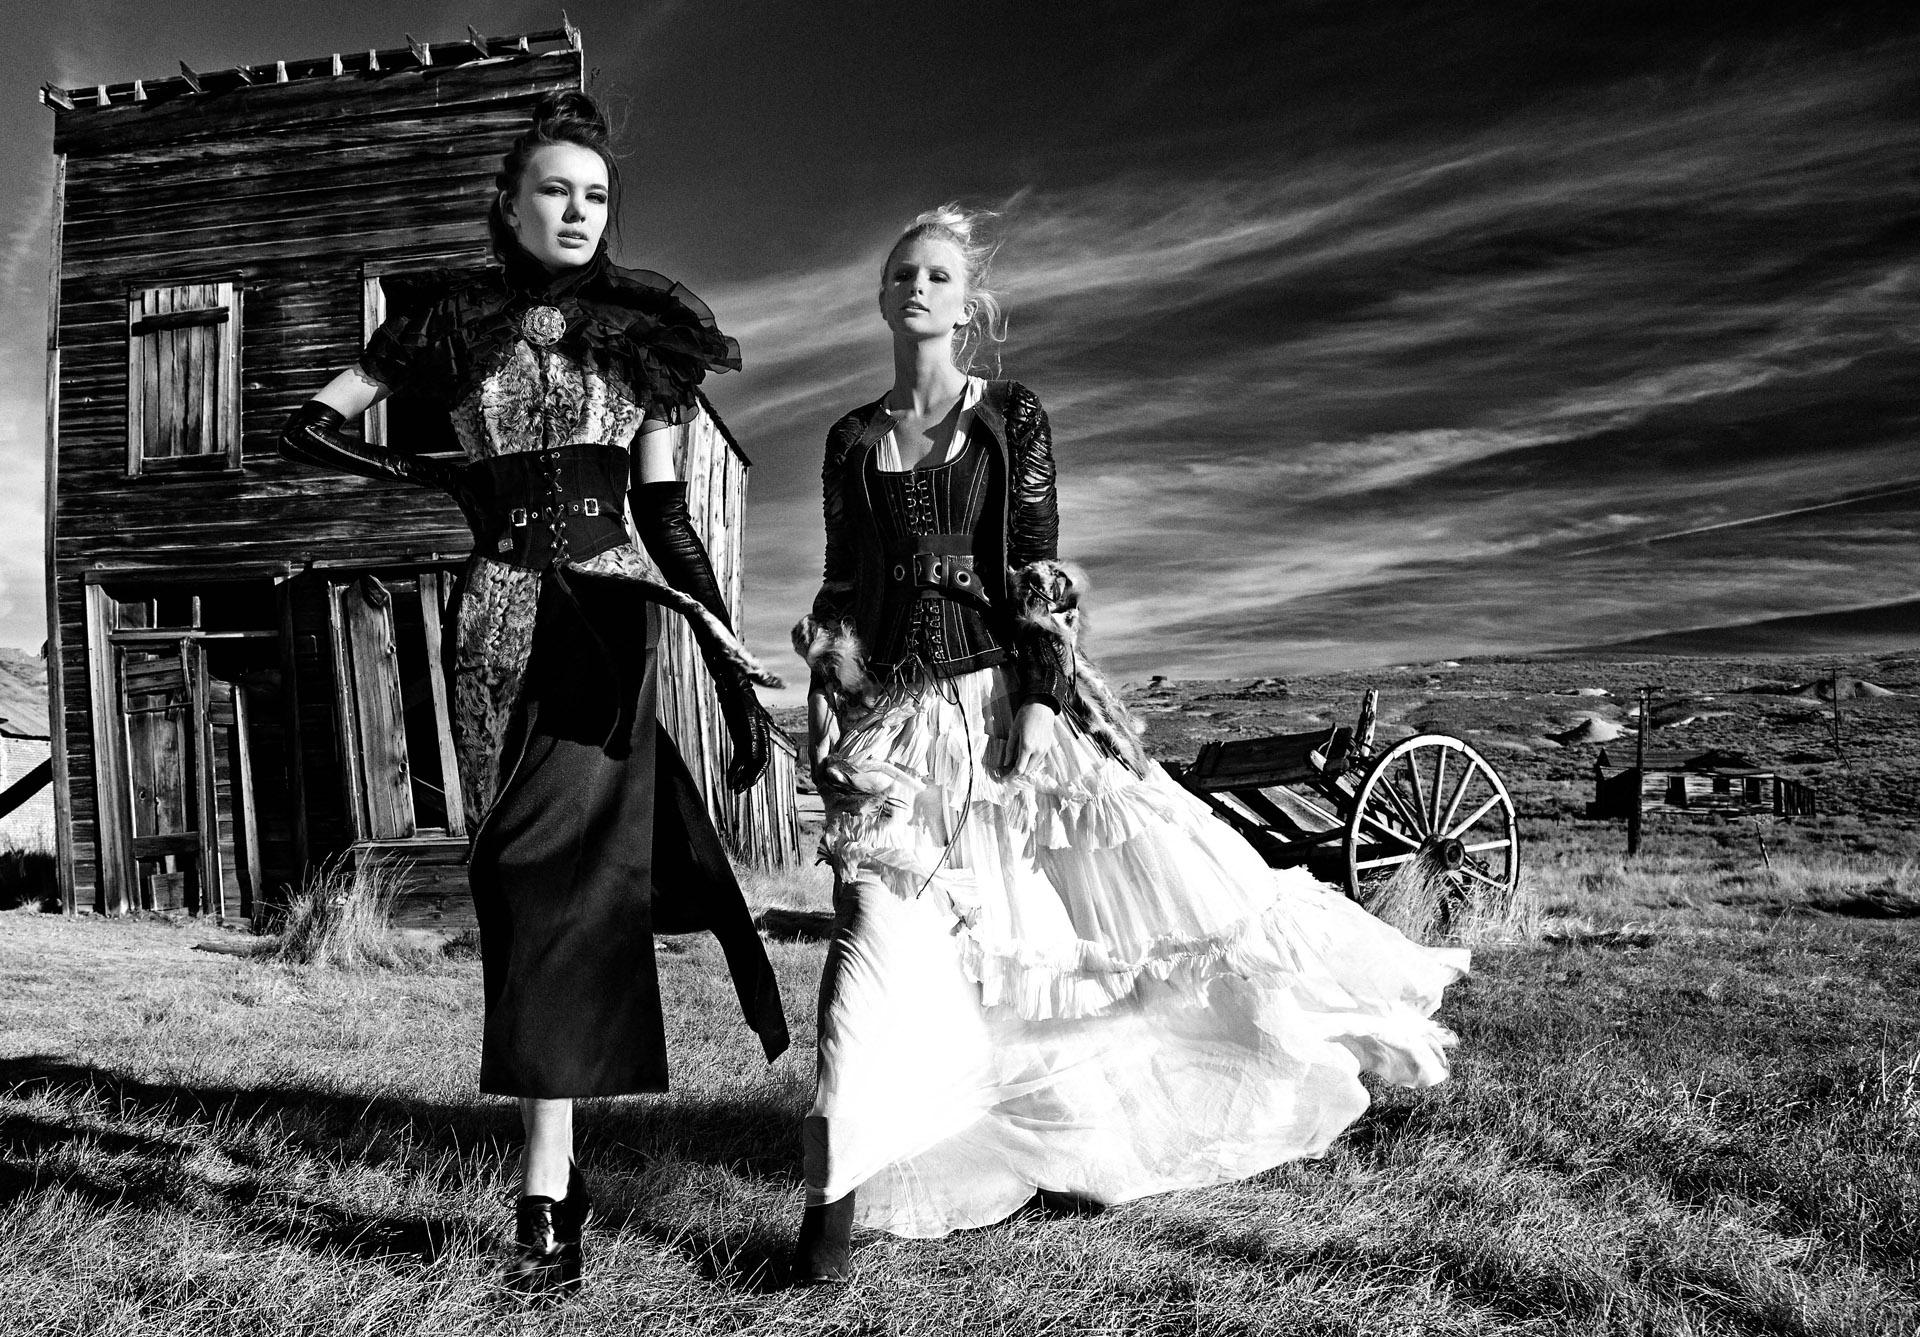 Spirit-&-Flesh-Magazine_LAS-DESPERADAS_by_MEG-WEBSTER_and_ATHANASIA-NICHOLS_003